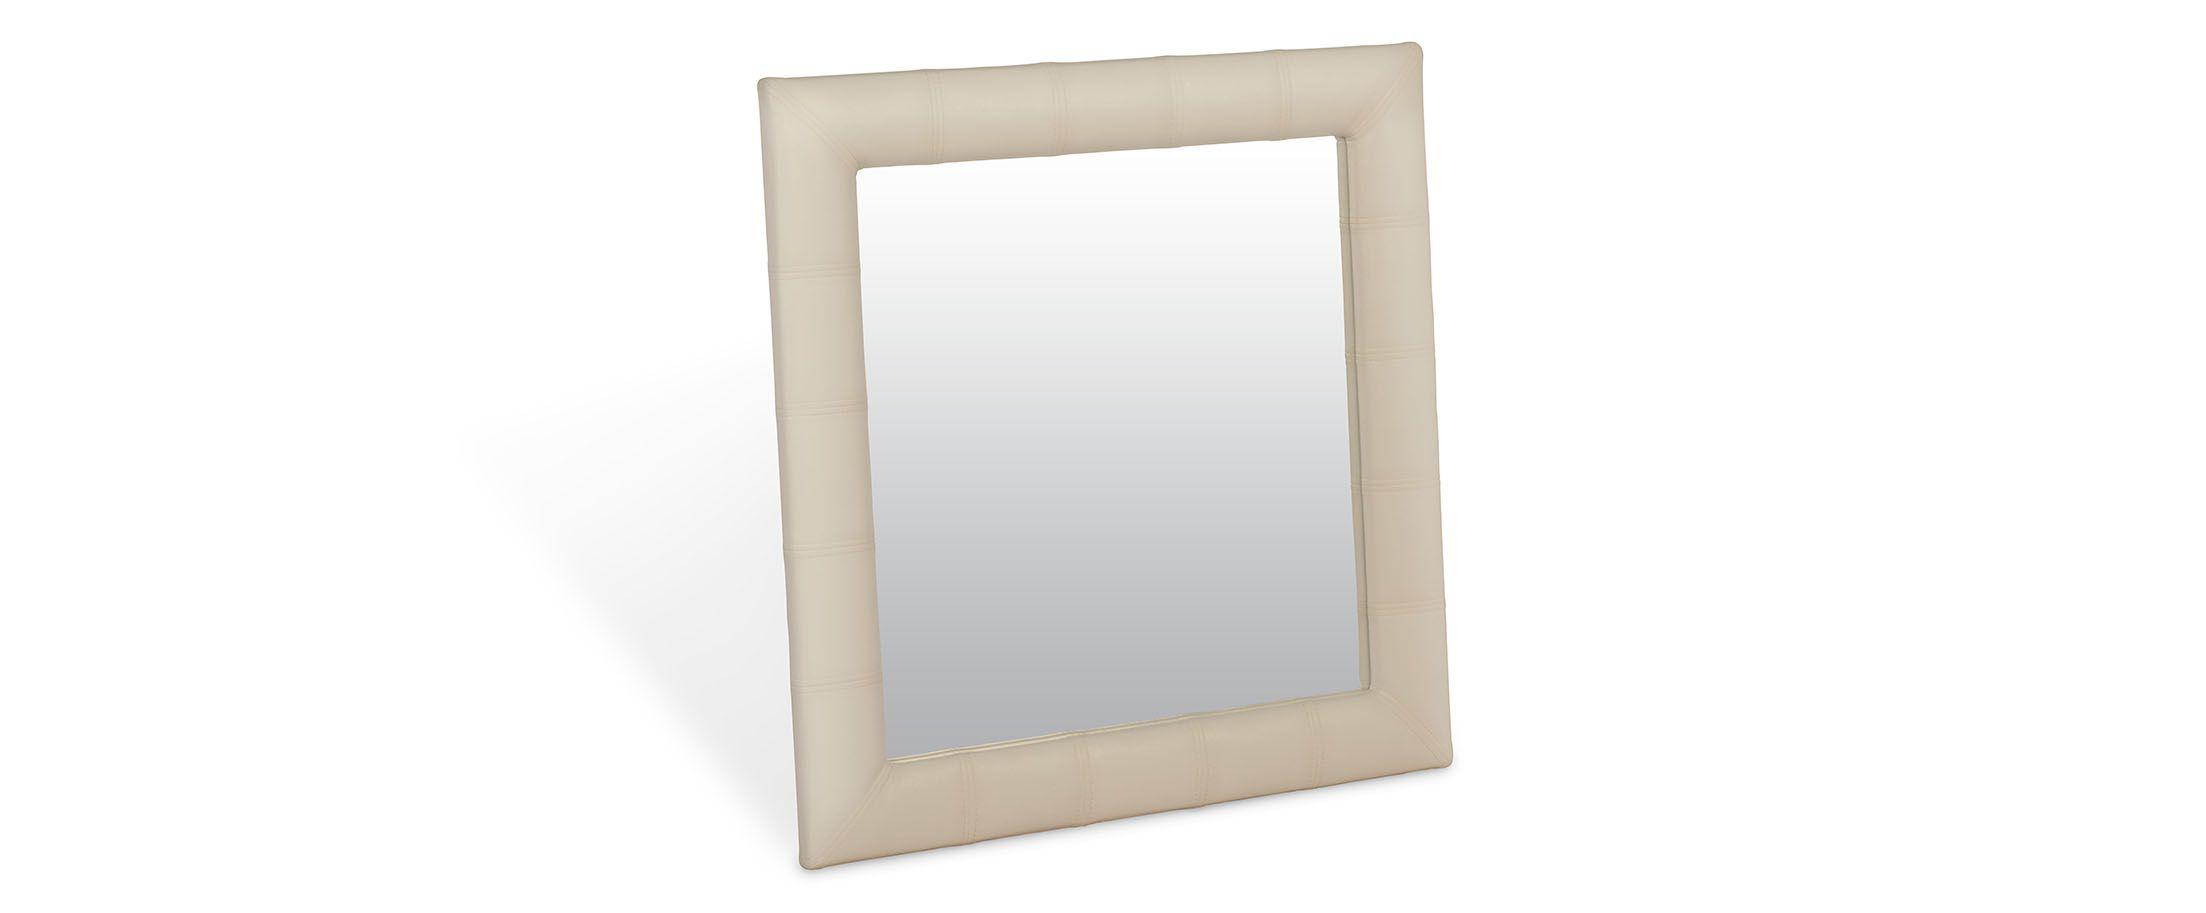 Зеркало Кааба квадратное суфле от MOON TRADE